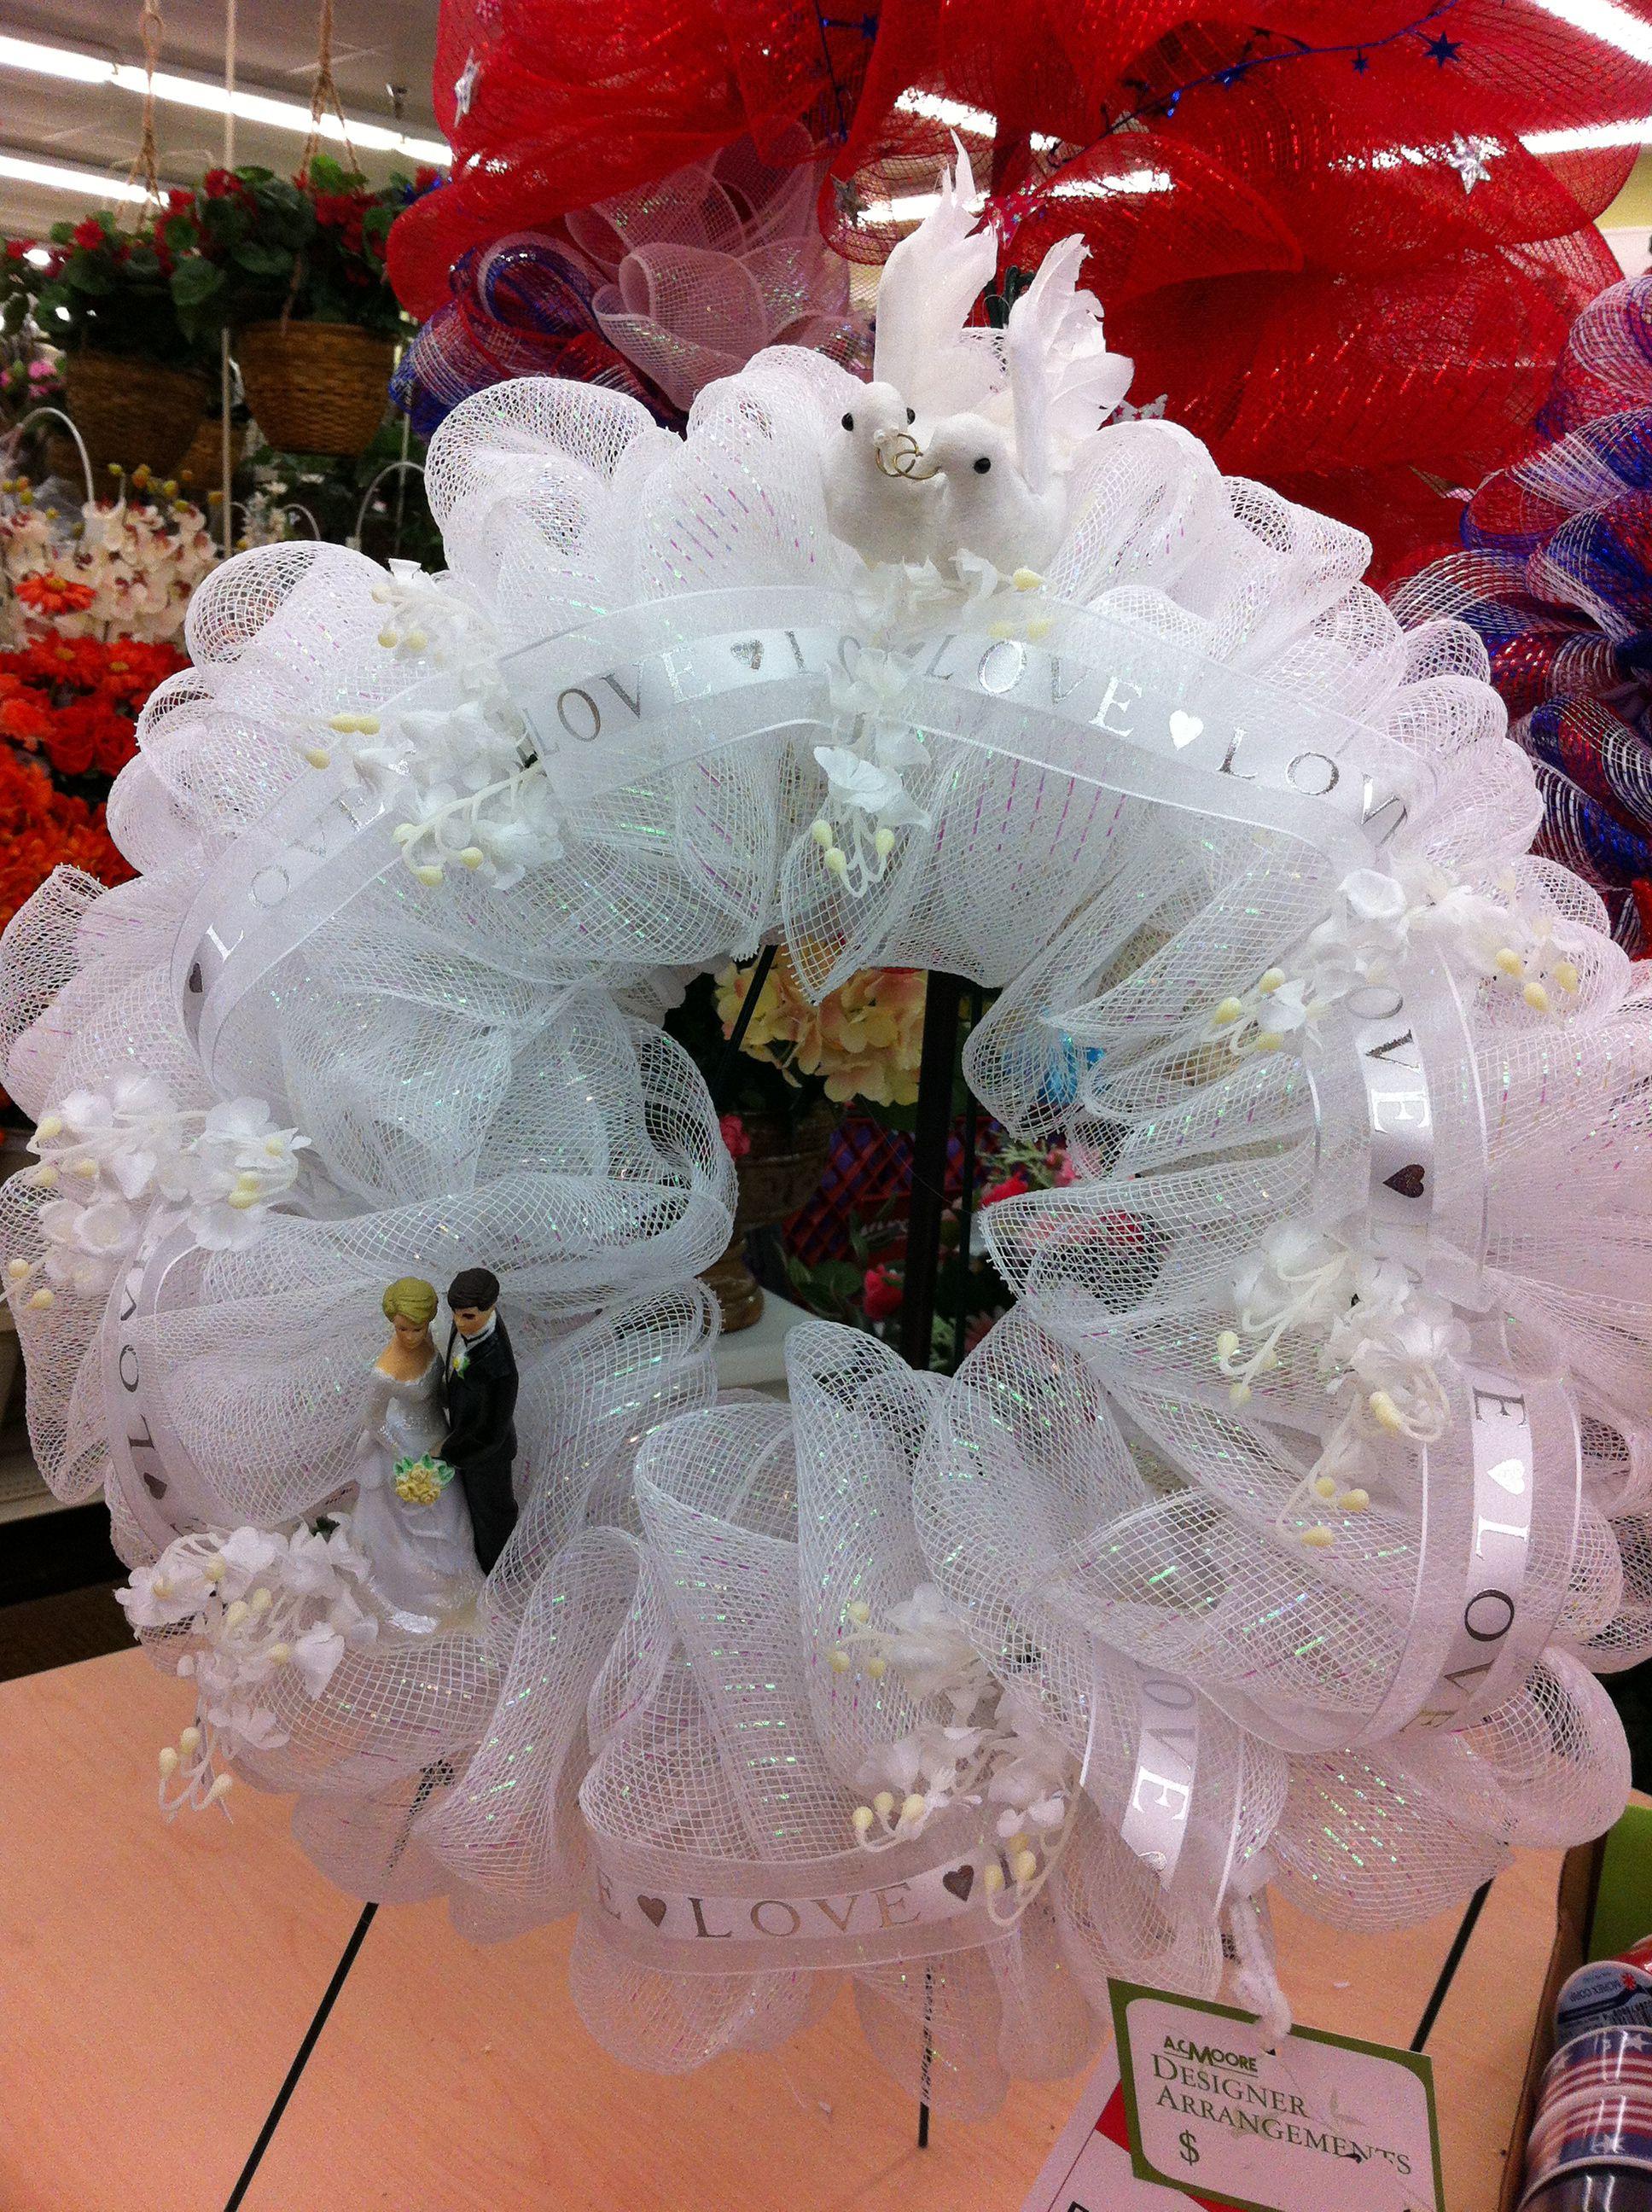 The Happy Couple Deco Mesh Wreath A.C. Moore Deptford, NJ #decomesh #wreath